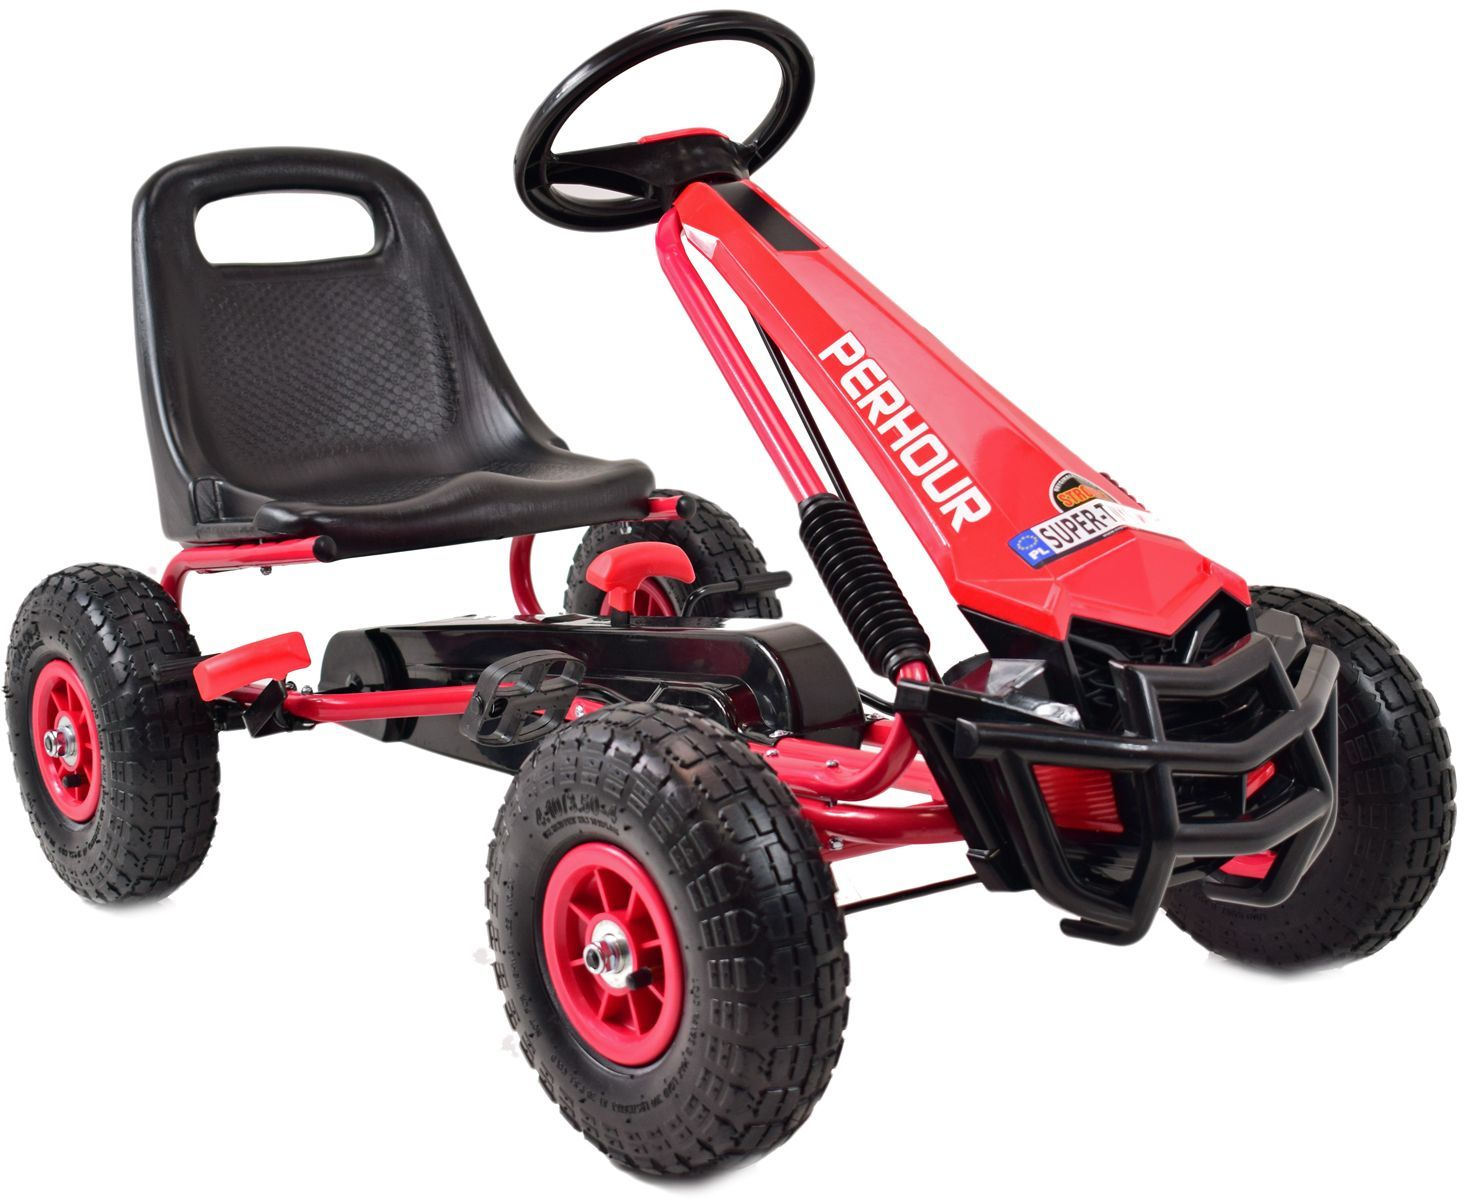 Rolly Toys Traktor na Pedały z Biegami Mercedes Benz Łyżka 3-8 Lat LK